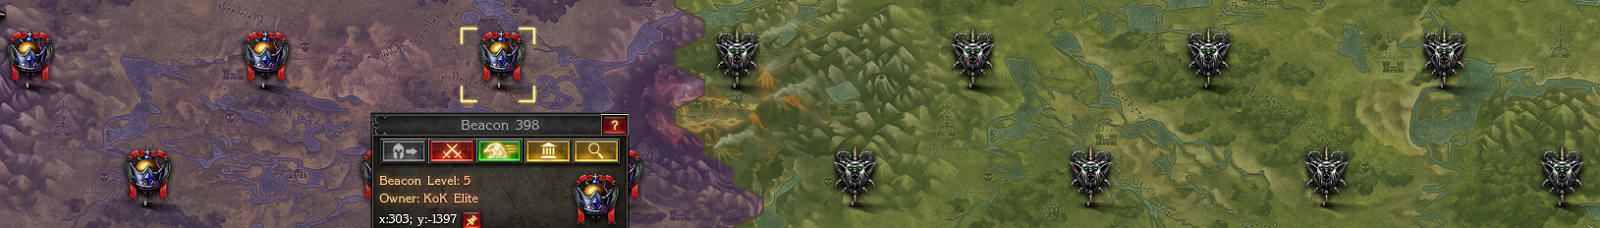 KoK Elite Destiny